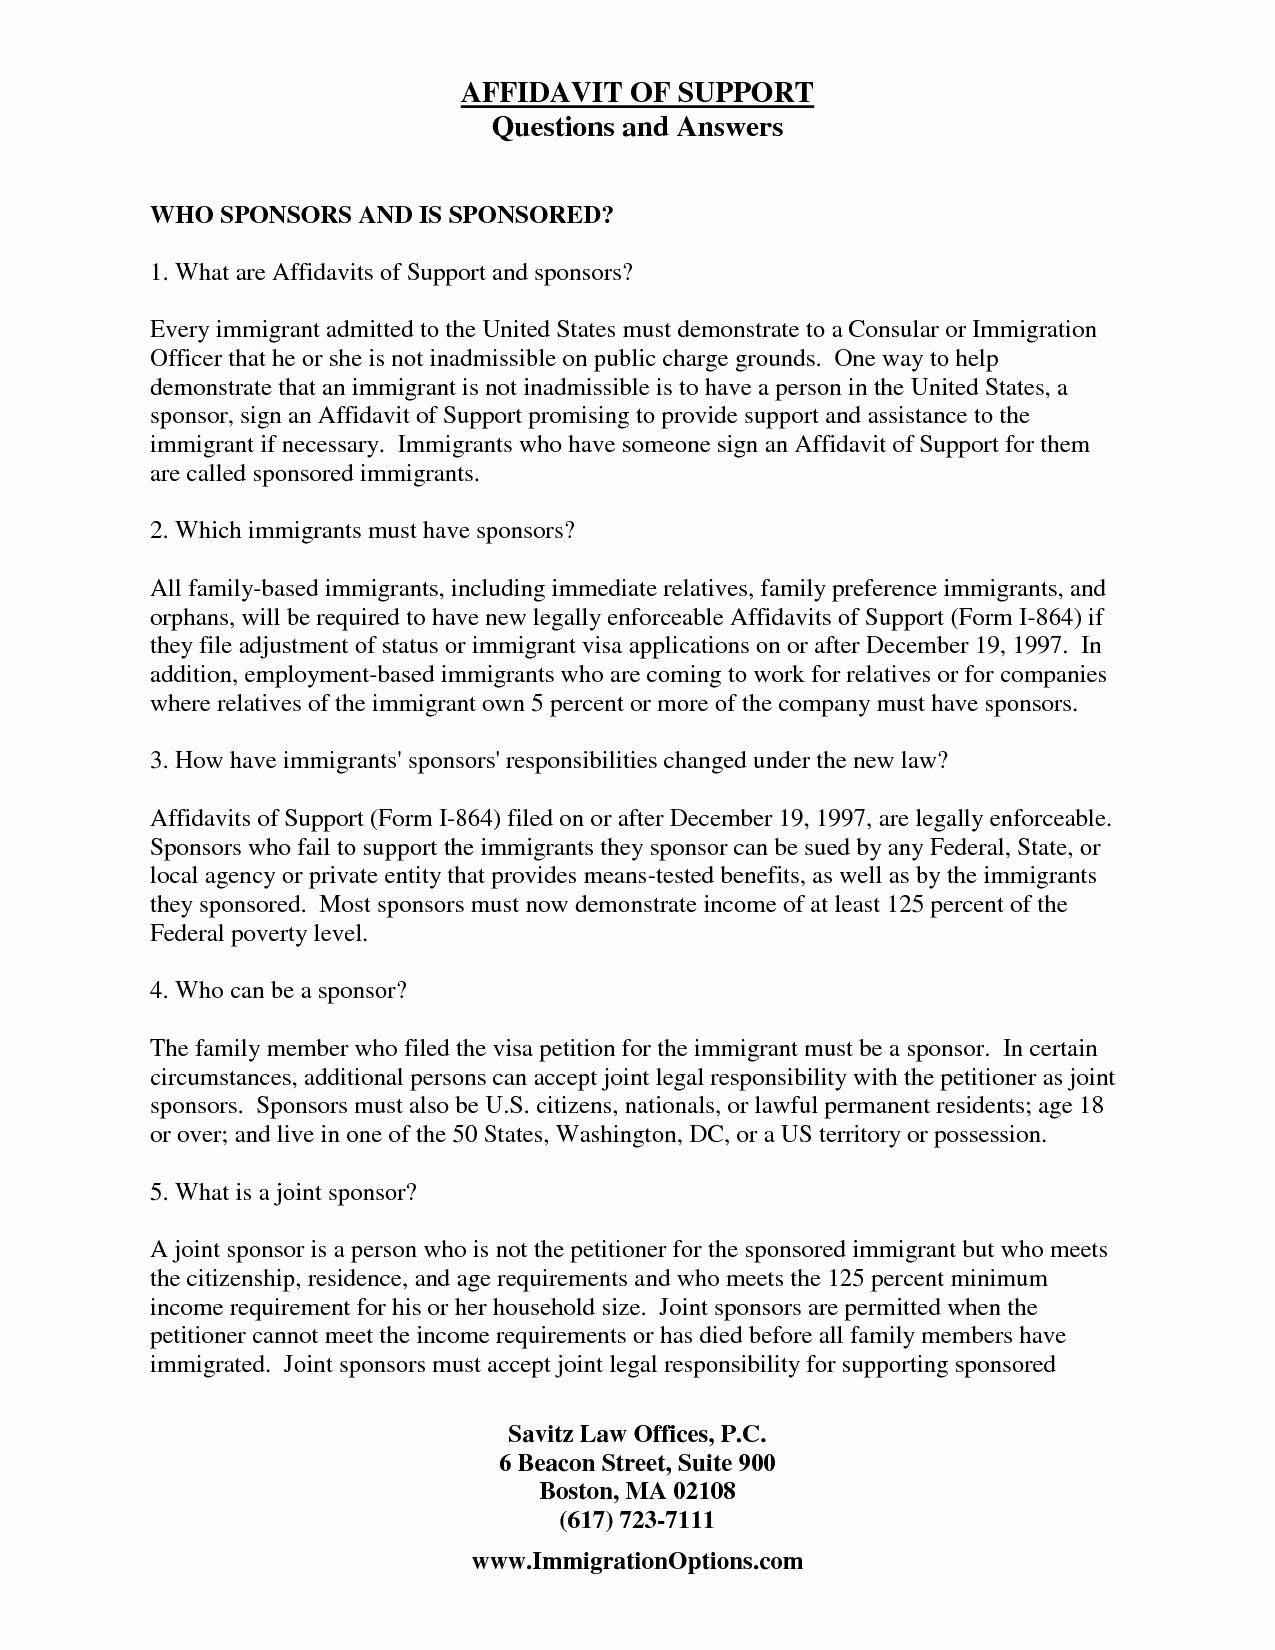 Affidavit Support Letter Beautiful Best S Of Affidavit Support Template Affidavit